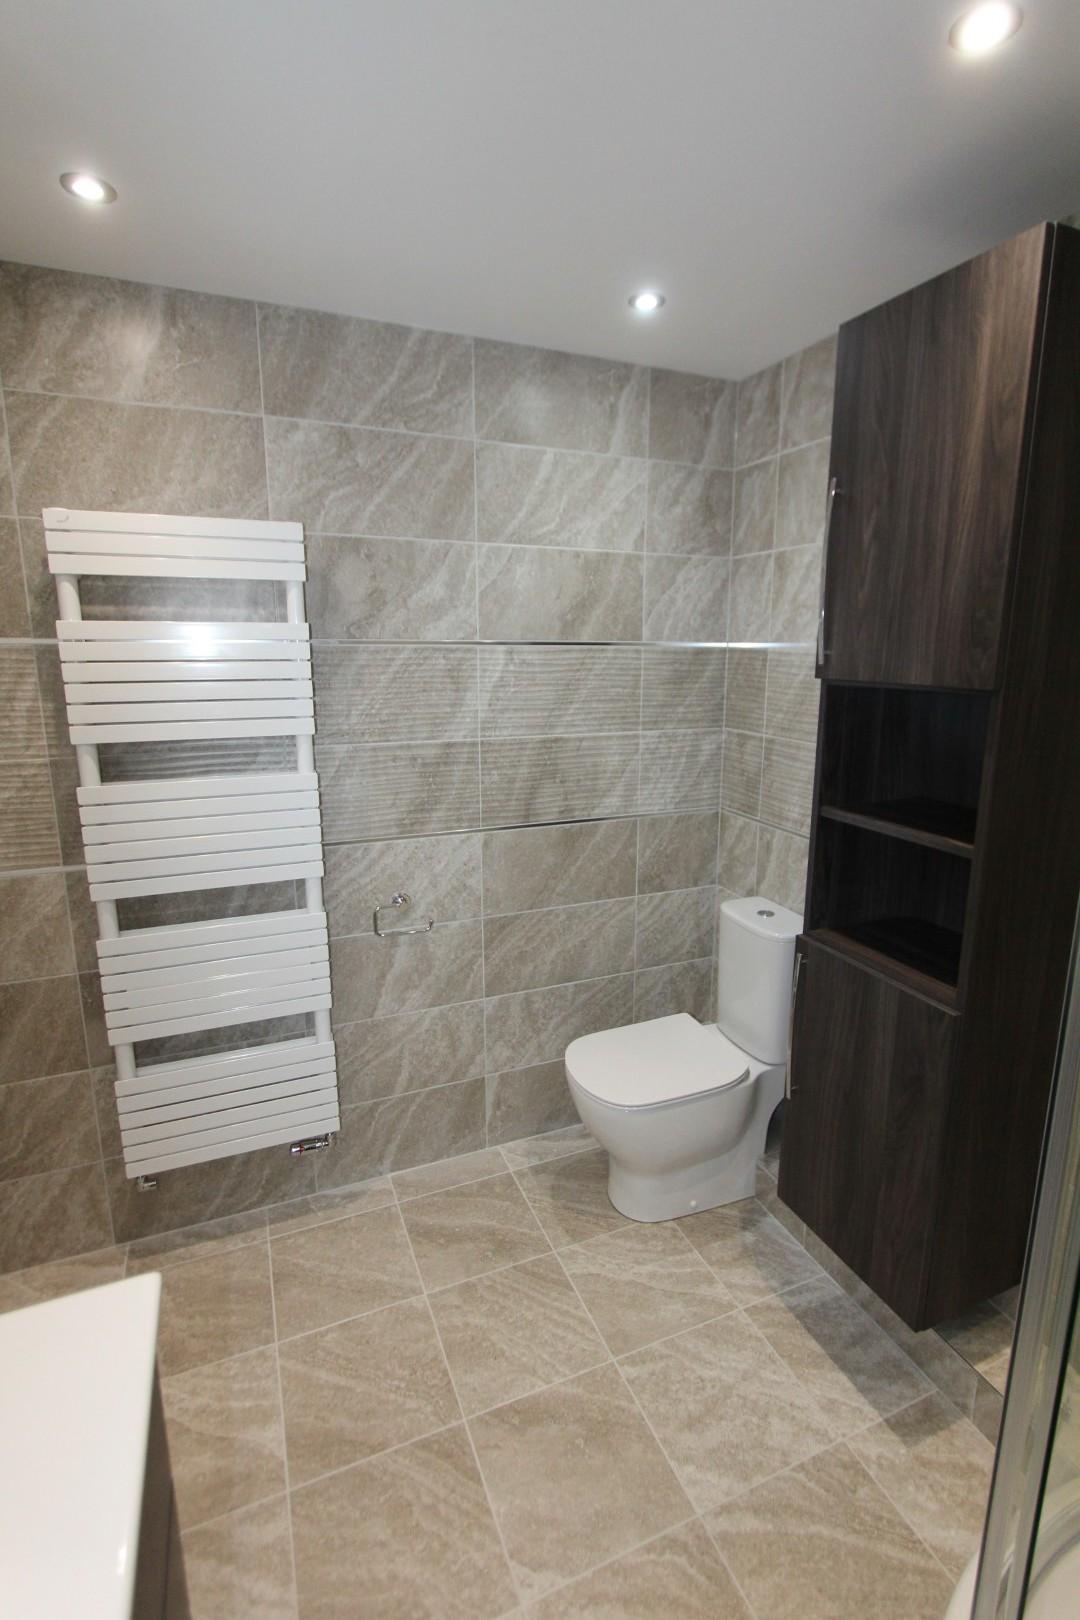 Dack Atlantic Bathrooms & Kitchens (13).jpeg